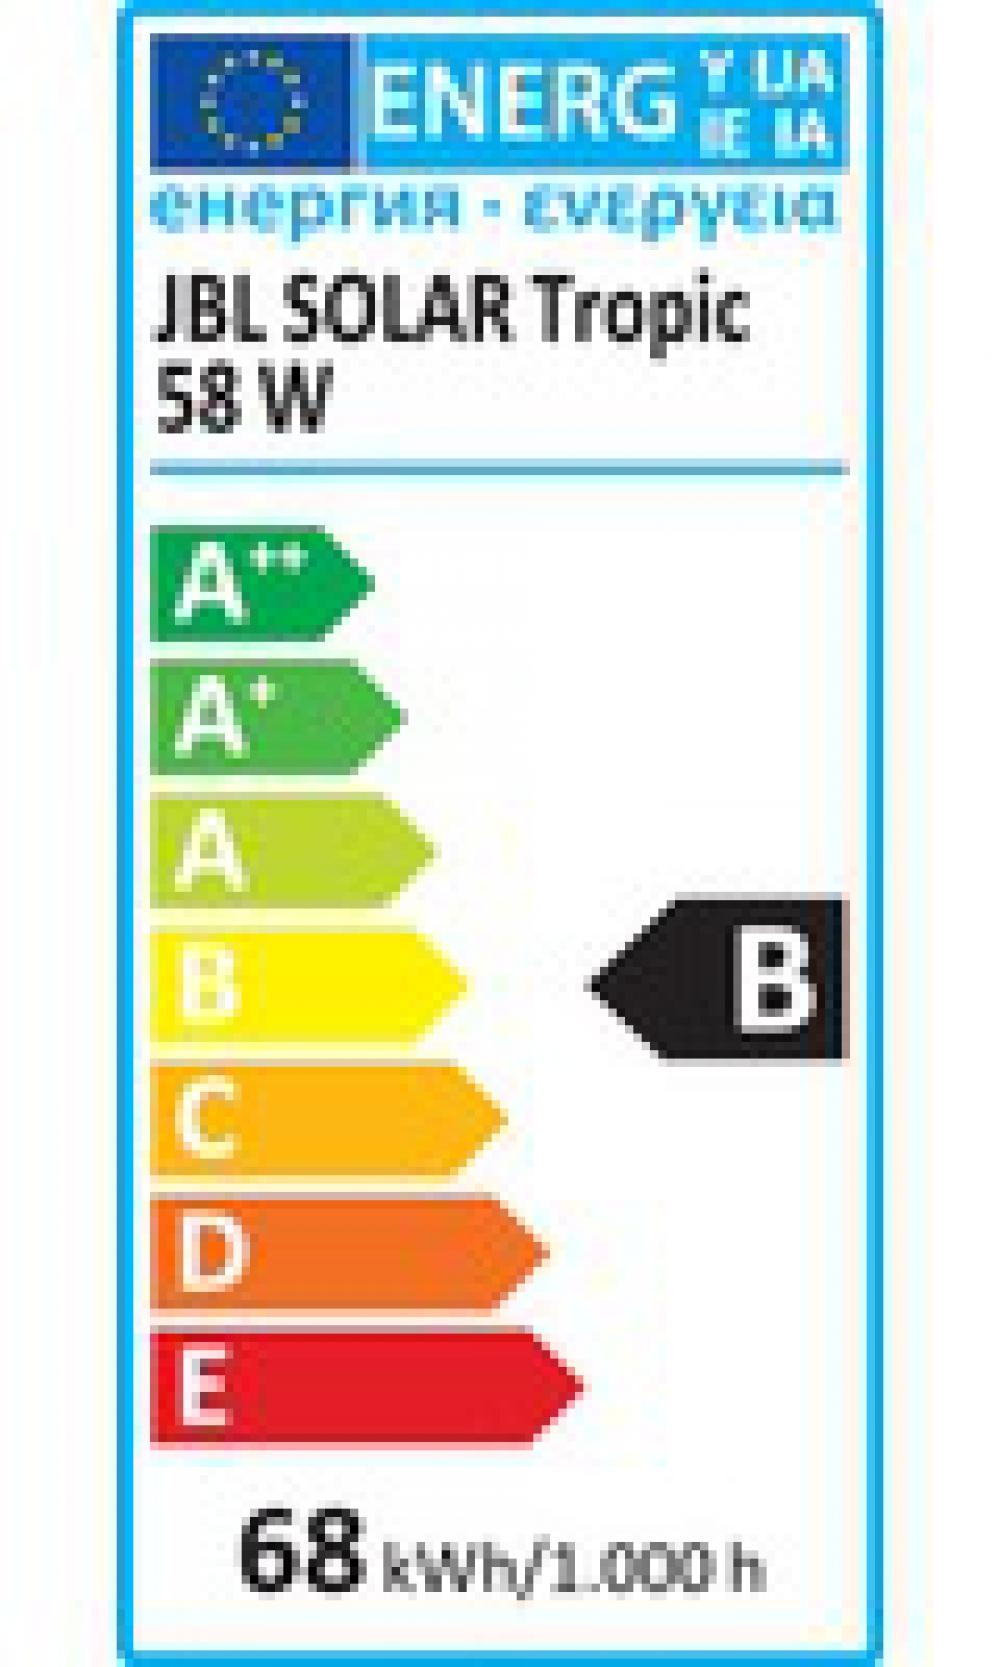 JBL SOLAR TROPIC 58 Вт, 1500 мм. Лампа полного спектра для аквариумных растений  - 2